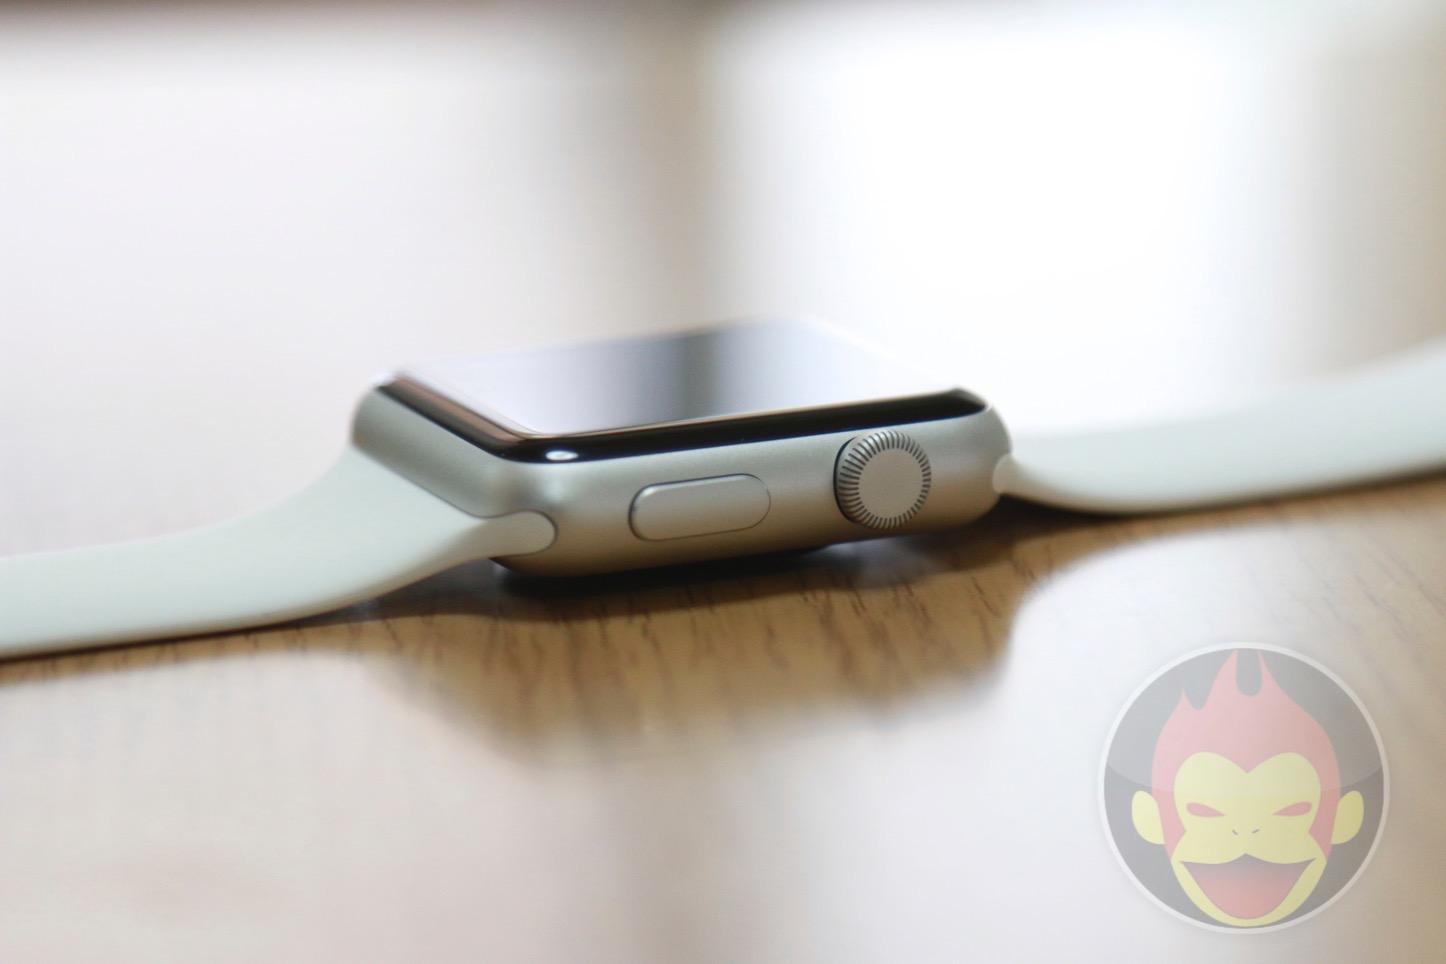 Apple-Watch-Sport-Review-25.jpg